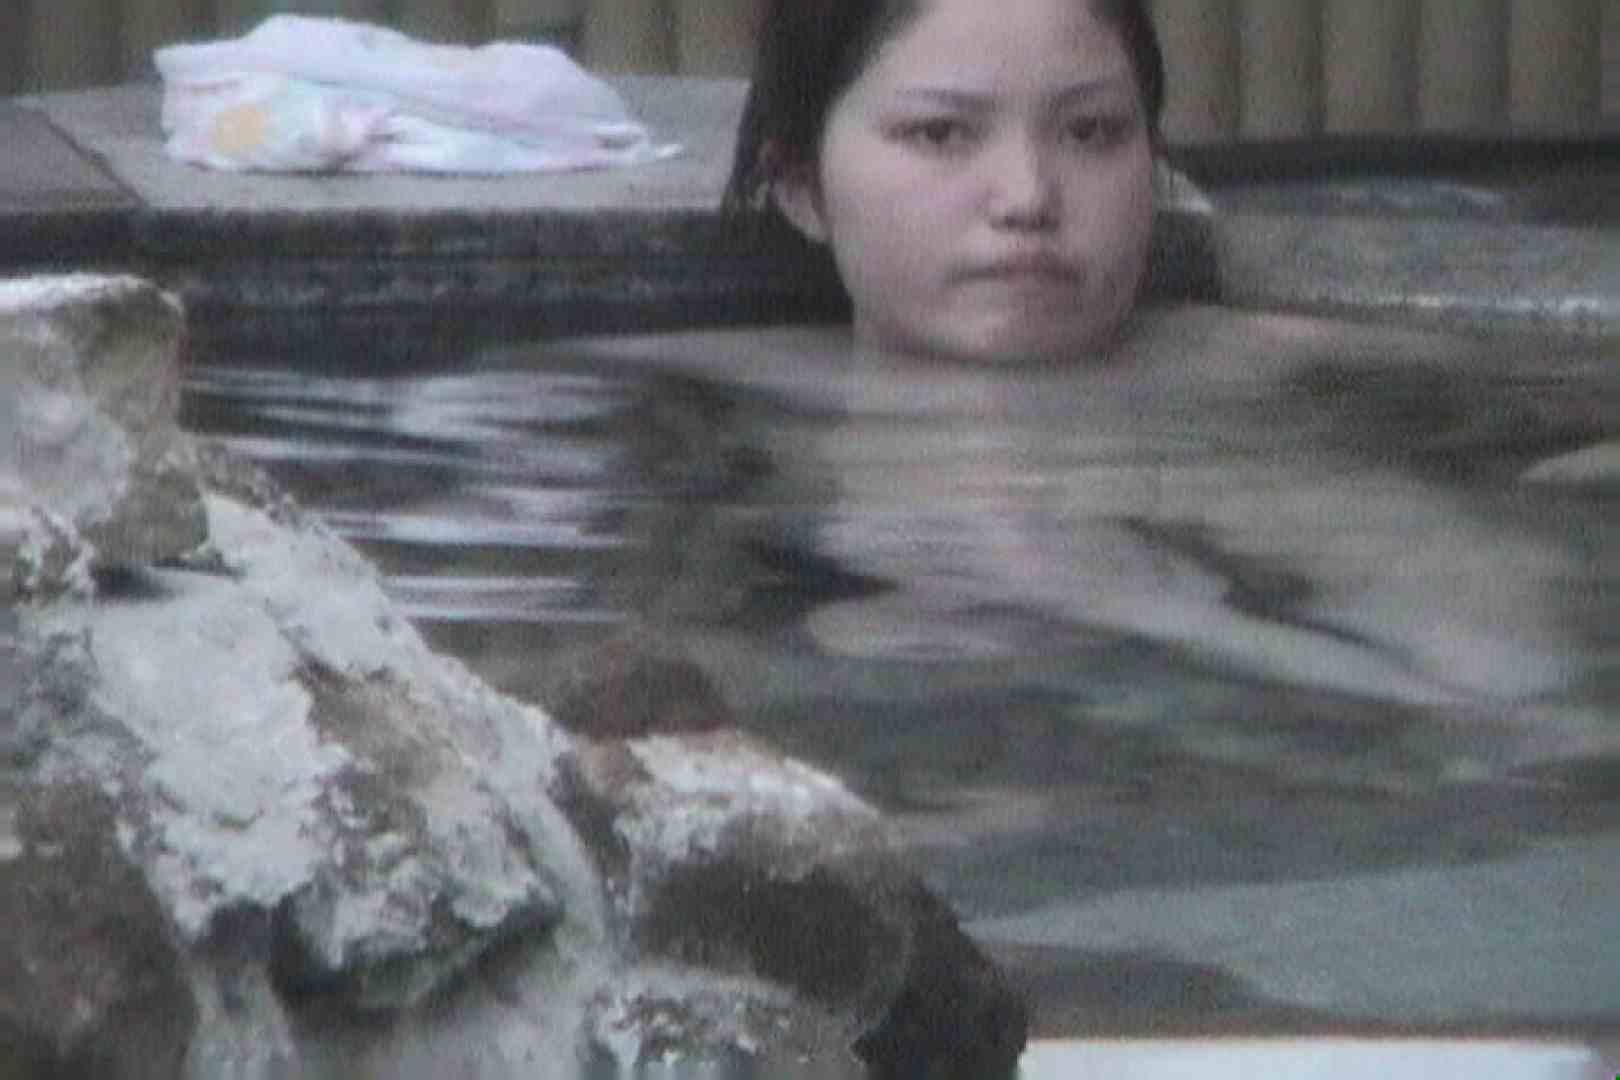 Aquaな露天風呂Vol.602 露天風呂編 | 盗撮シリーズ  83PIX 79